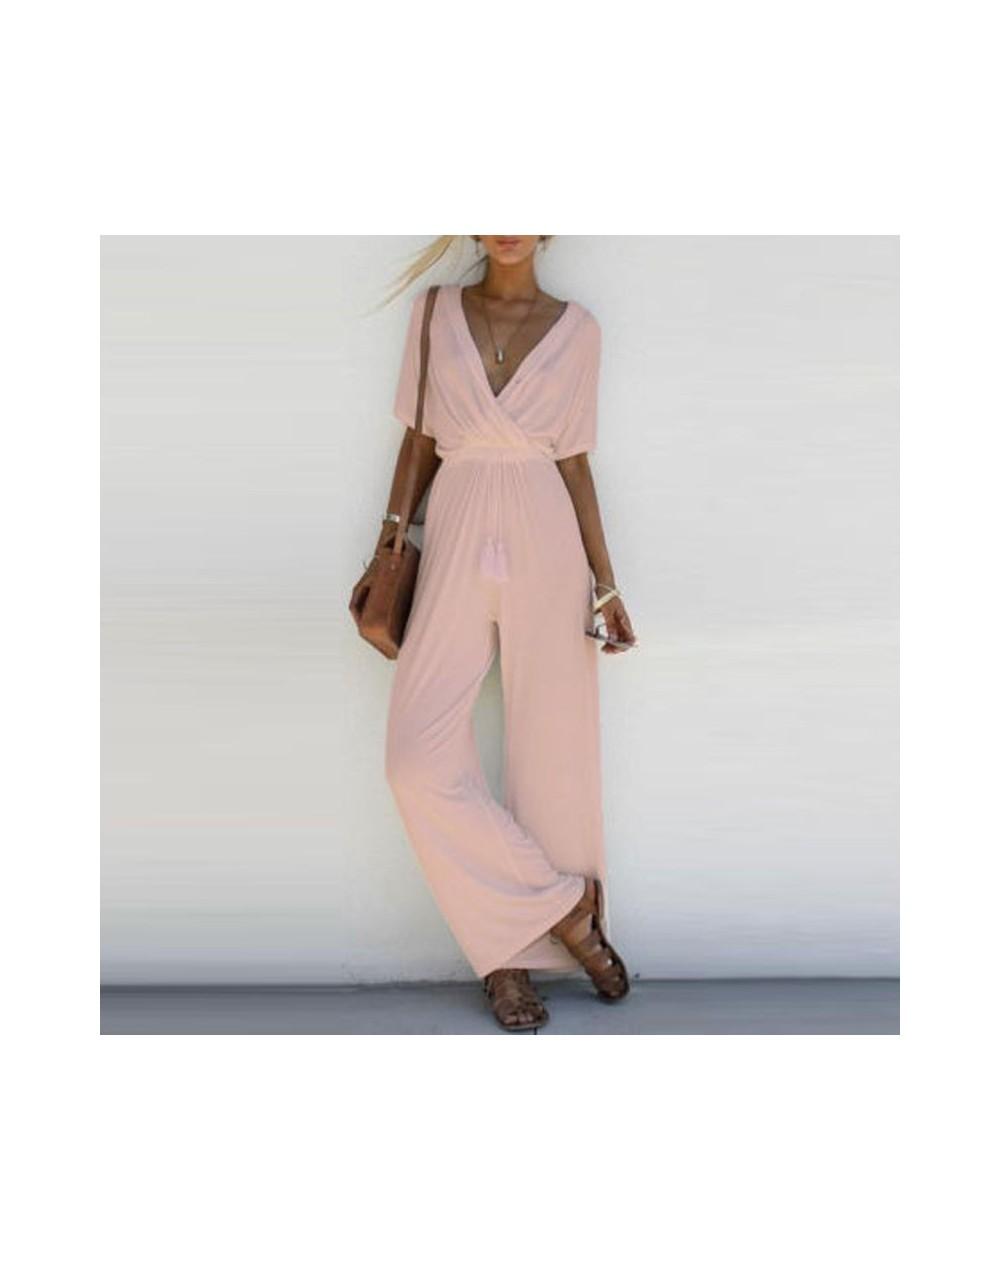 Fashion Women V Neck Loose Playsuit Party Ladies Romper Short Sleeve Long Jumpsuit S-XL - White - 463939370994-3